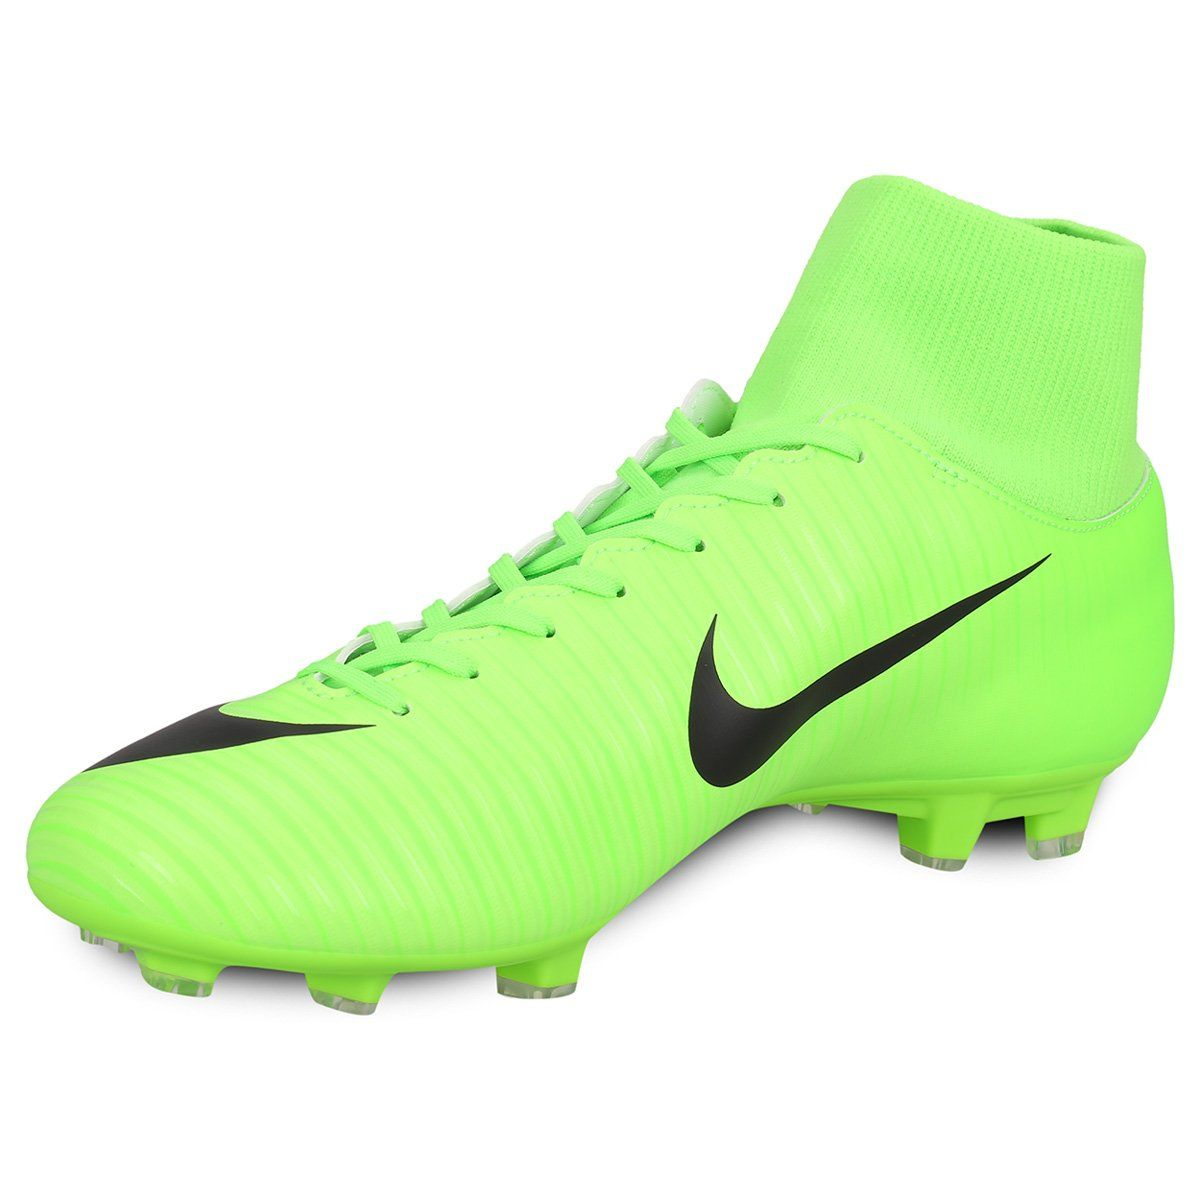 wholesale dealer 77d99 55220 Botines Nike Mercurial Victory VI DF FG - Verde Claro